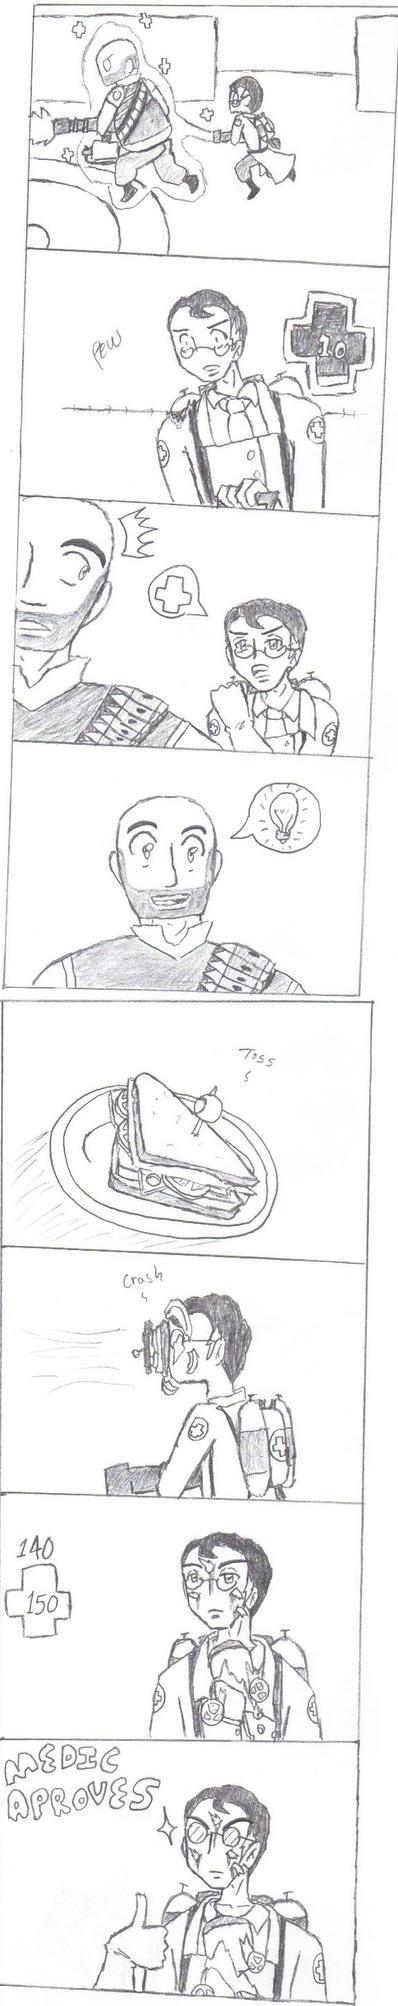 The Sandvich Comic by Yoshi317